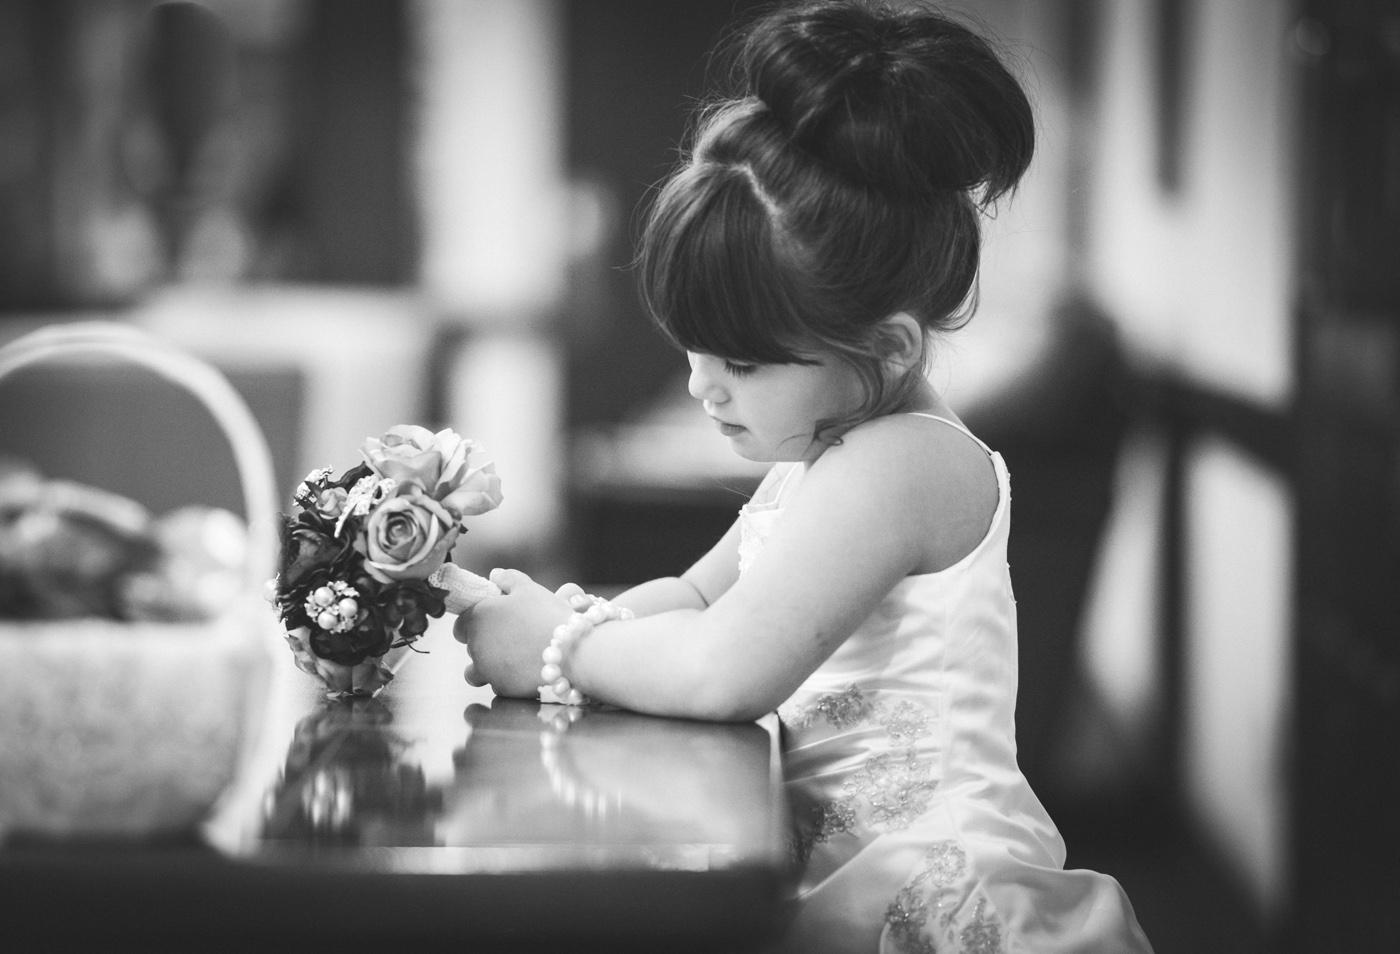 ss_weddingbest-31.jpg